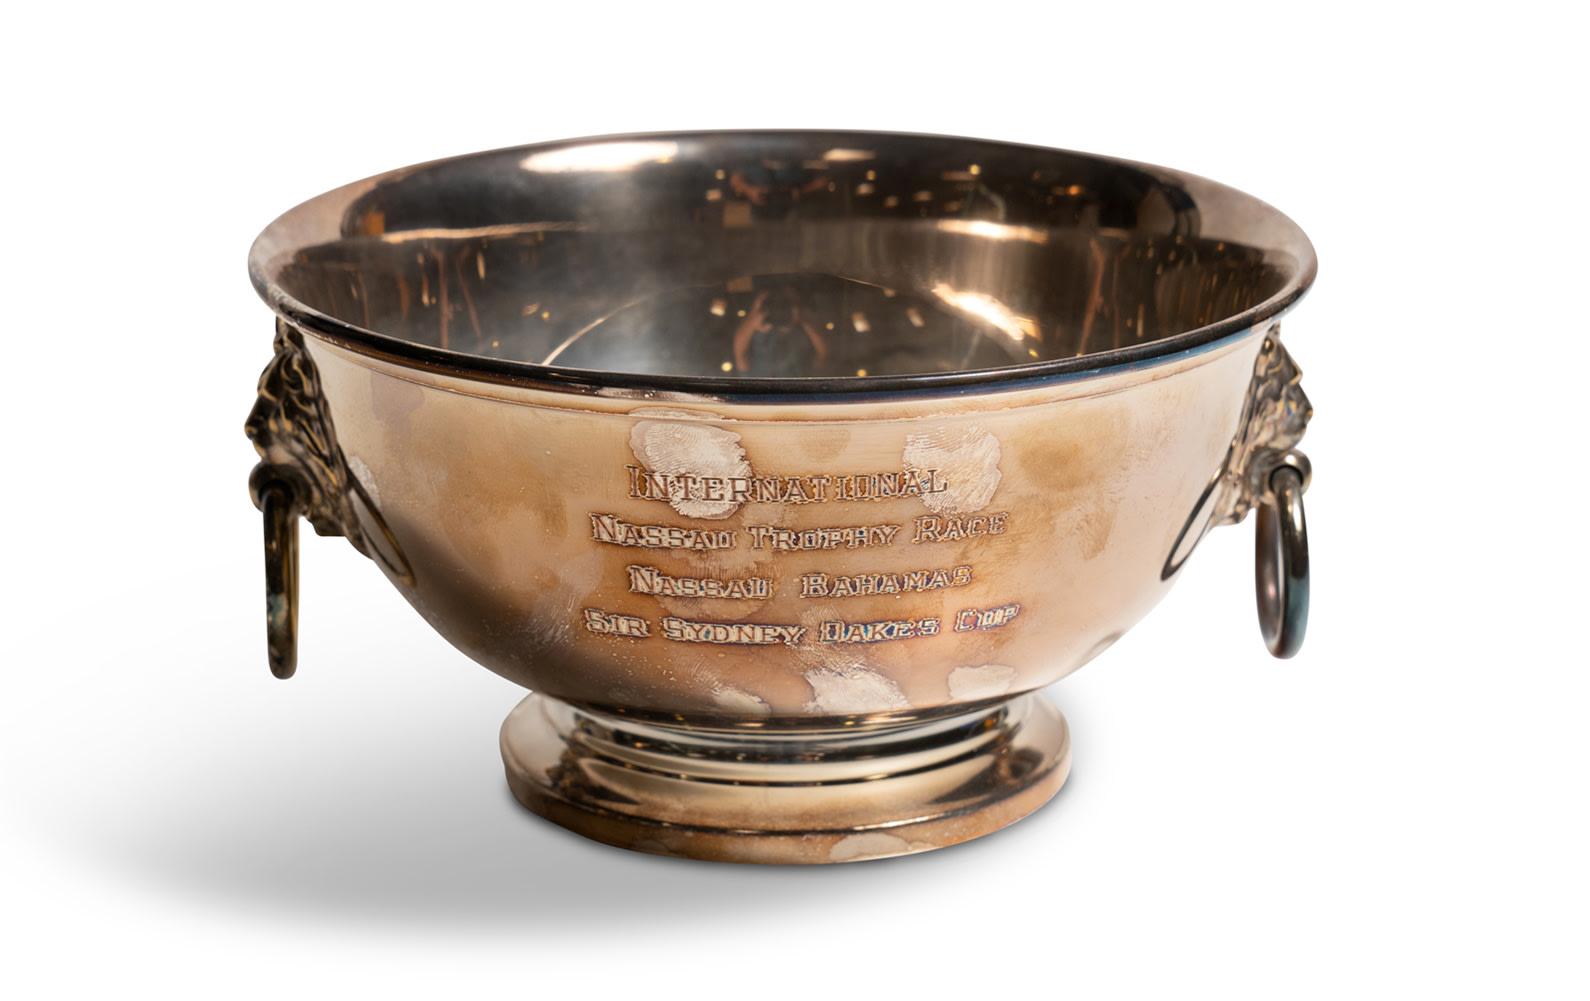 Nassau Trophy Race Sir Sydney Oakes Cup, Undated